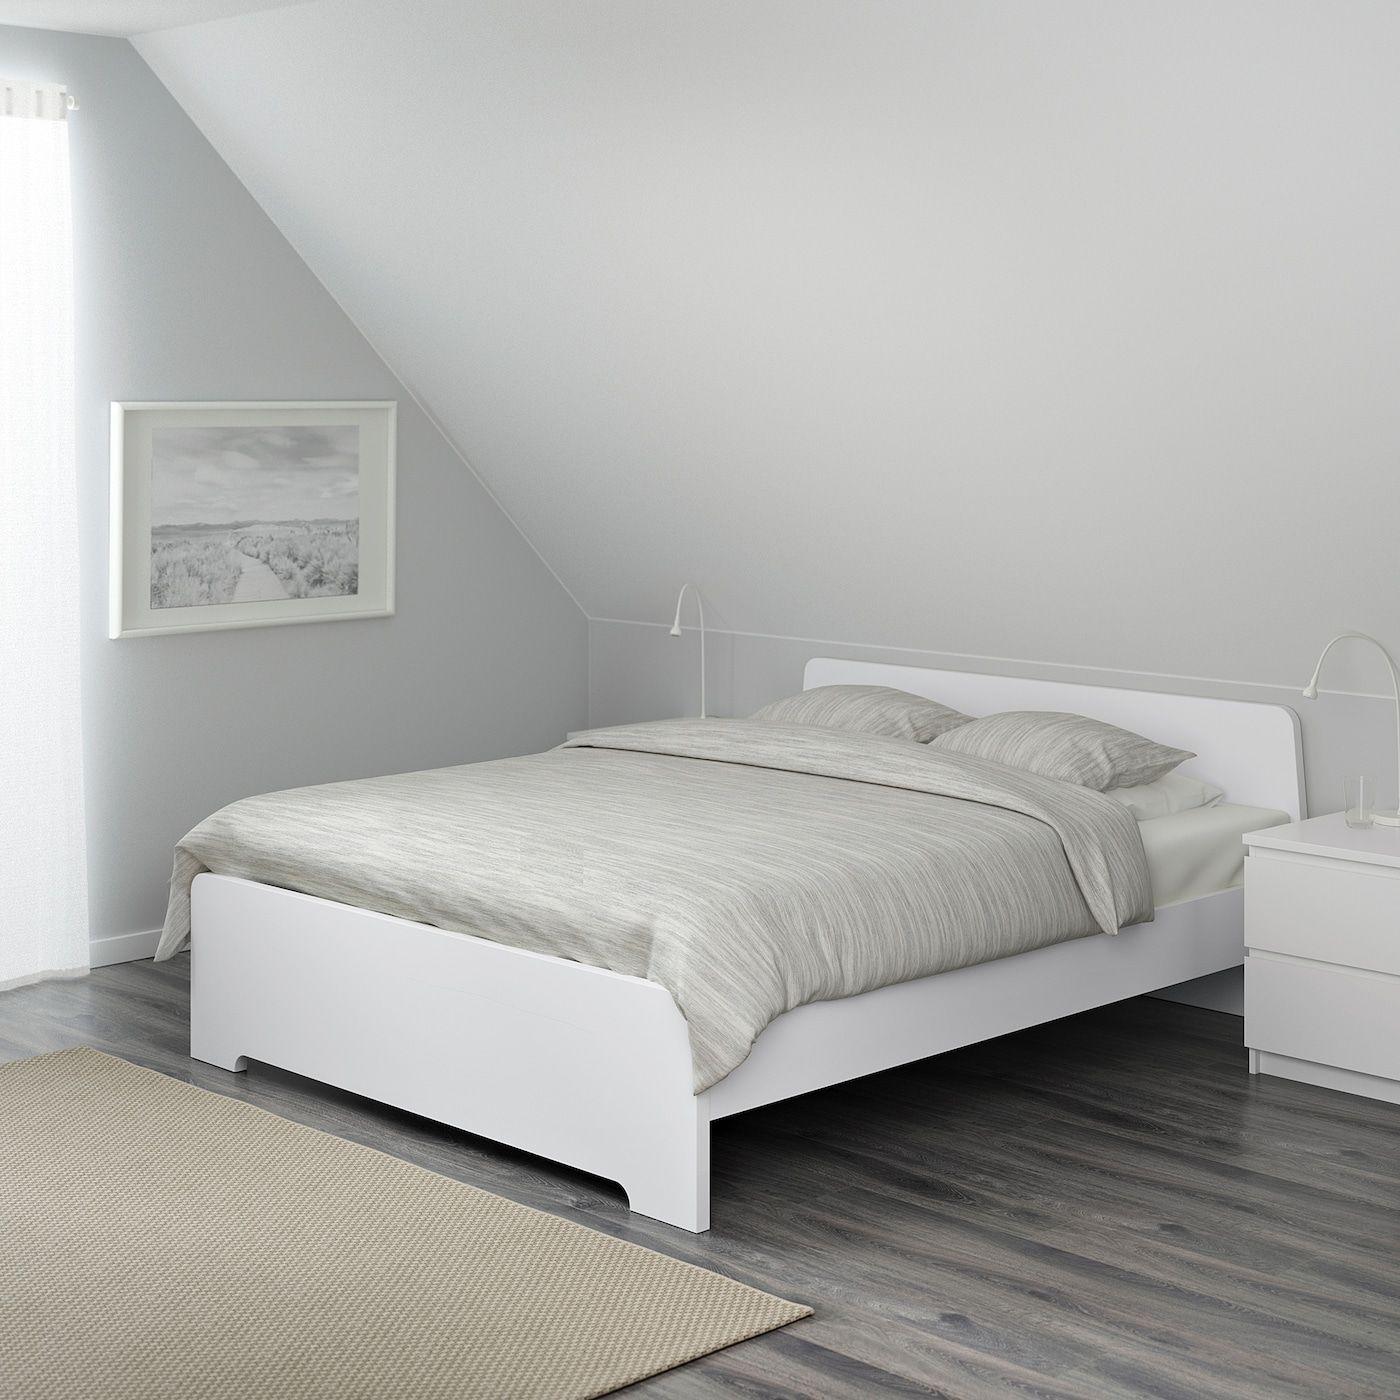 Ikea Askvoll White Luroy Bed Frame In 2020 White Bed Frame Adjustable Beds King Size Bed Frame